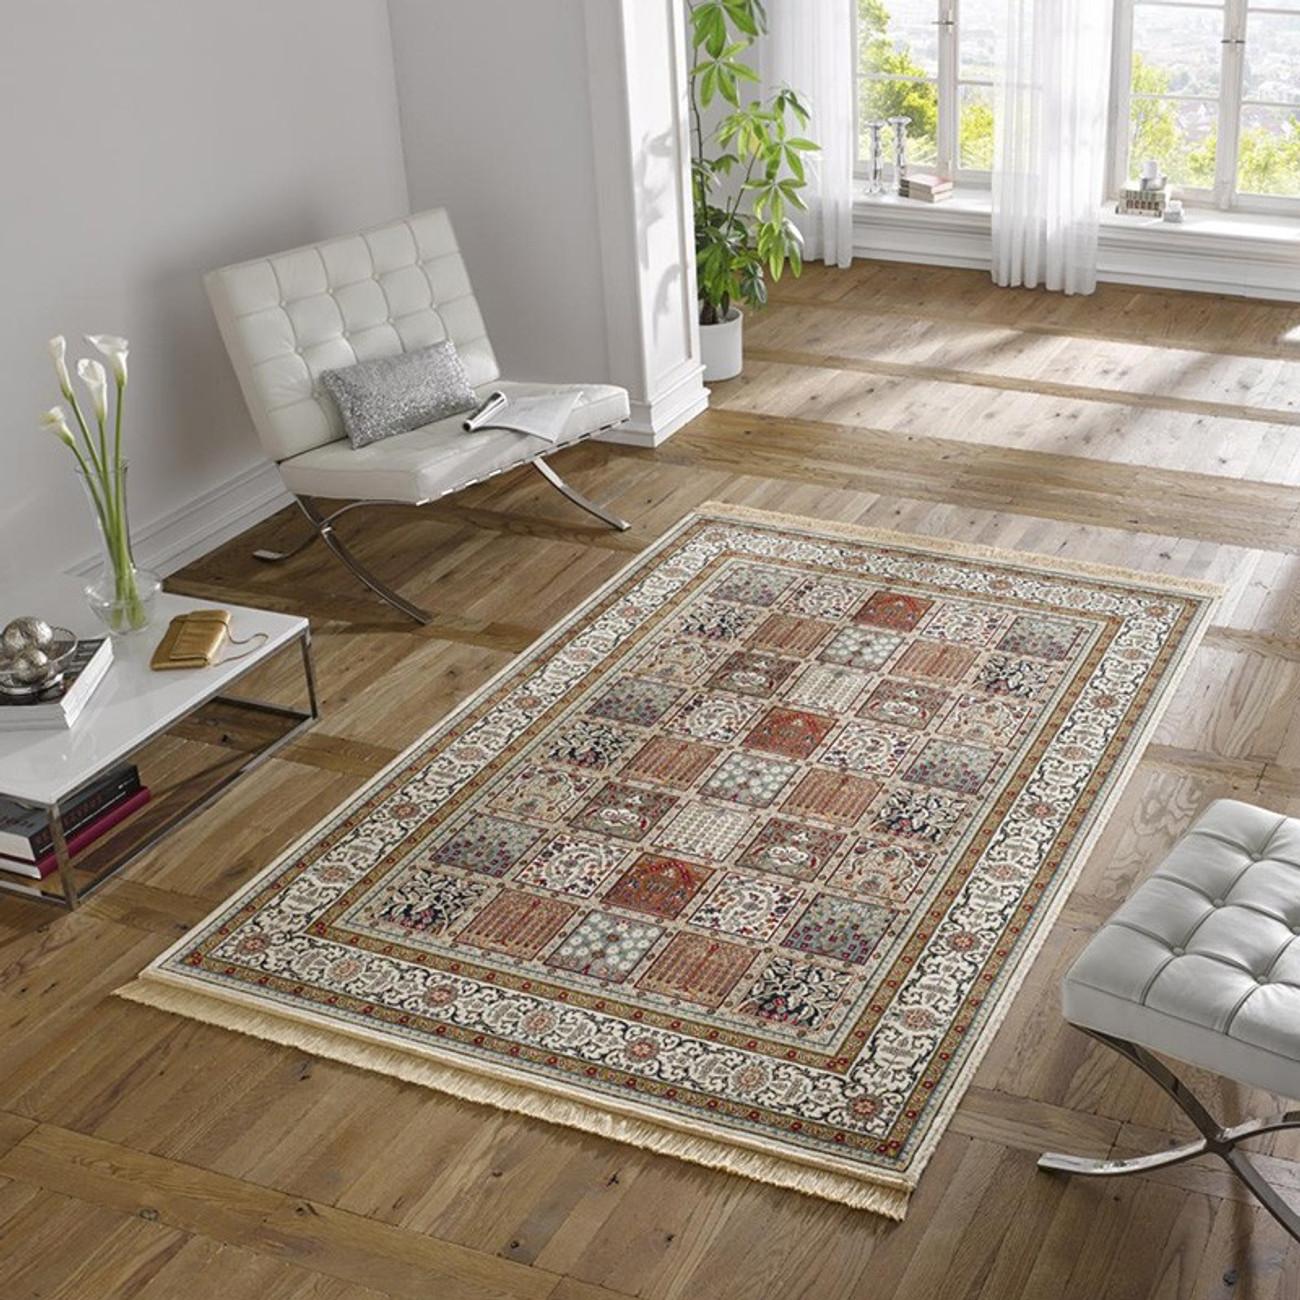 design teppich viskose mit fransen precious creme rot. Black Bedroom Furniture Sets. Home Design Ideas